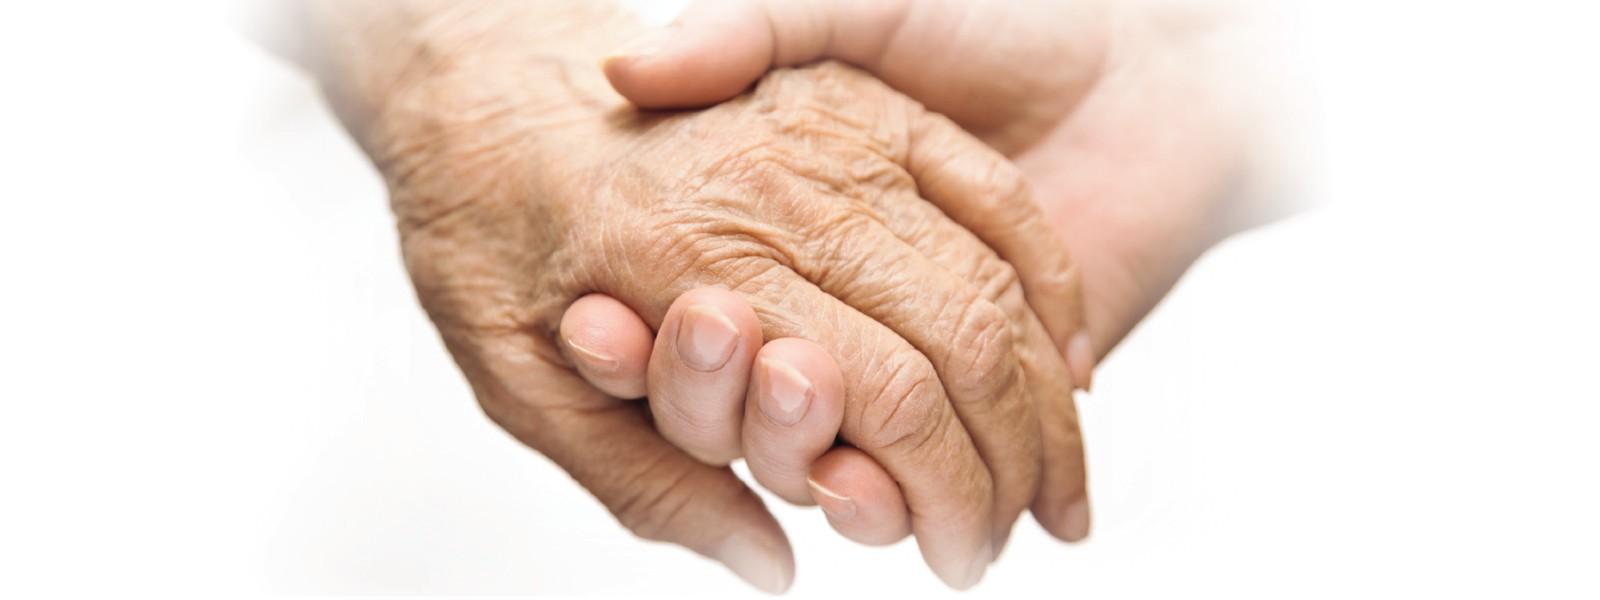 medjunardoni-dan-starijih-osoba